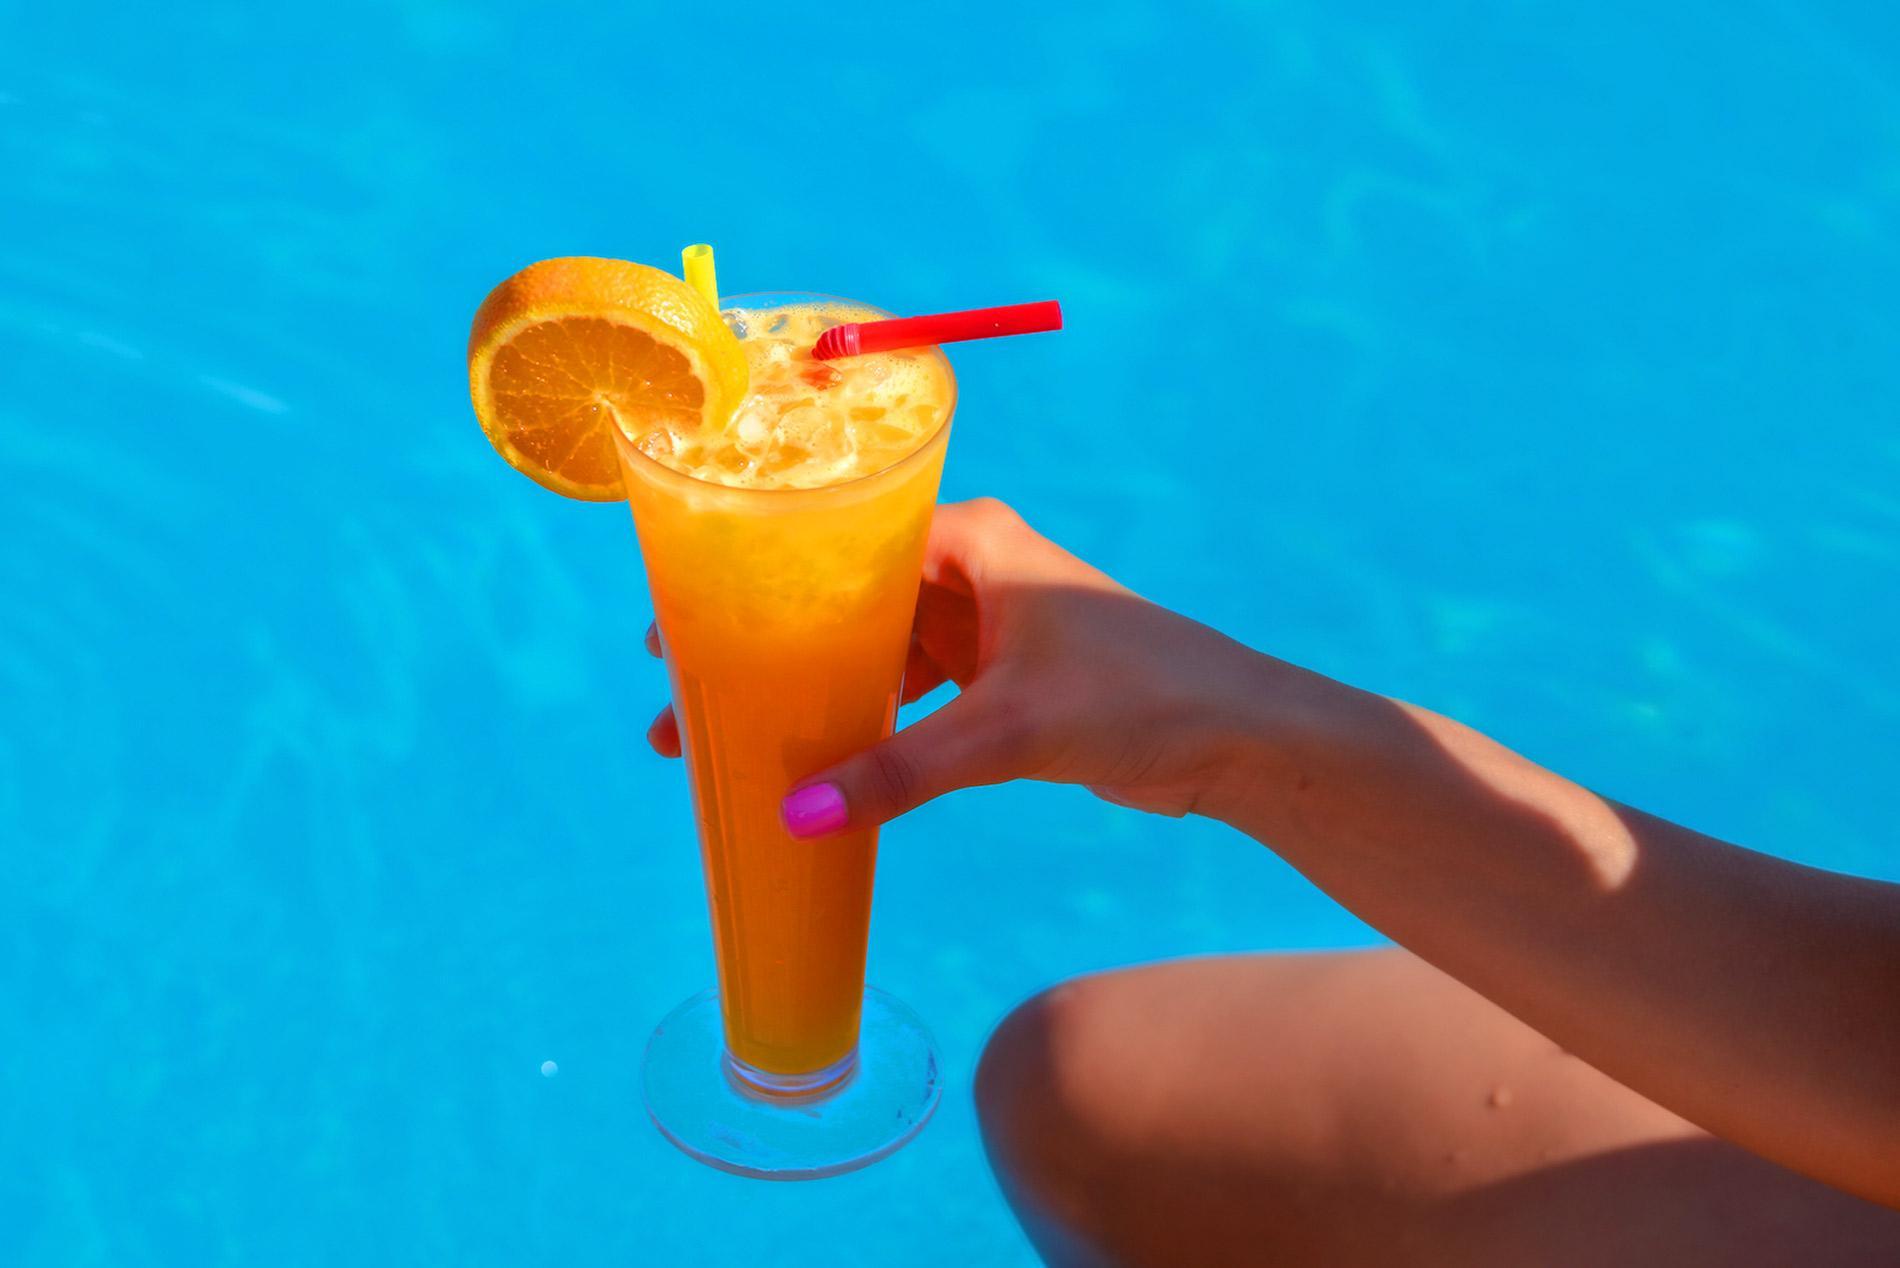 Alexander-Orange-Juice